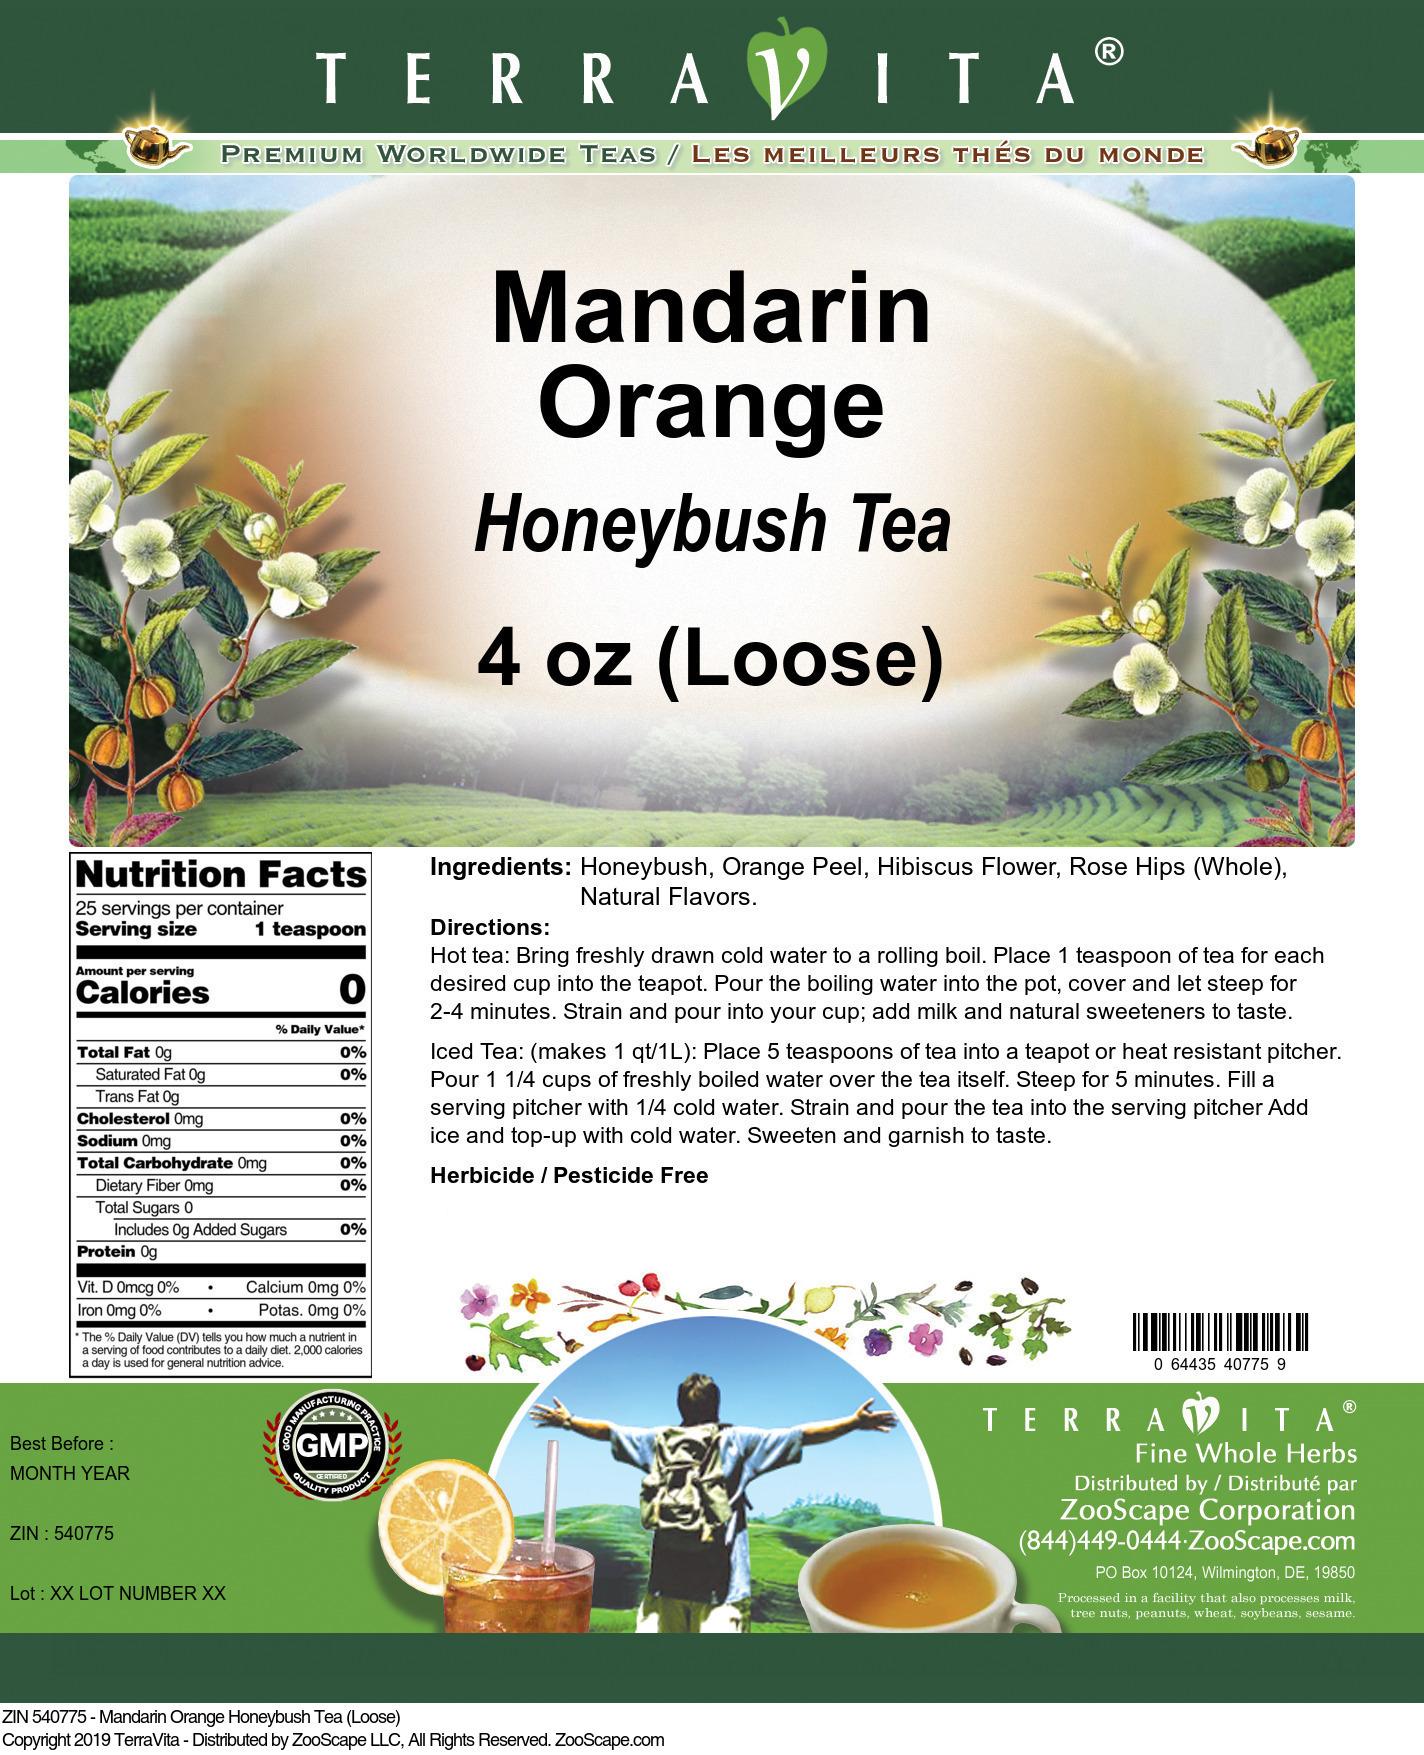 Mandarin Orange Honeybush Tea